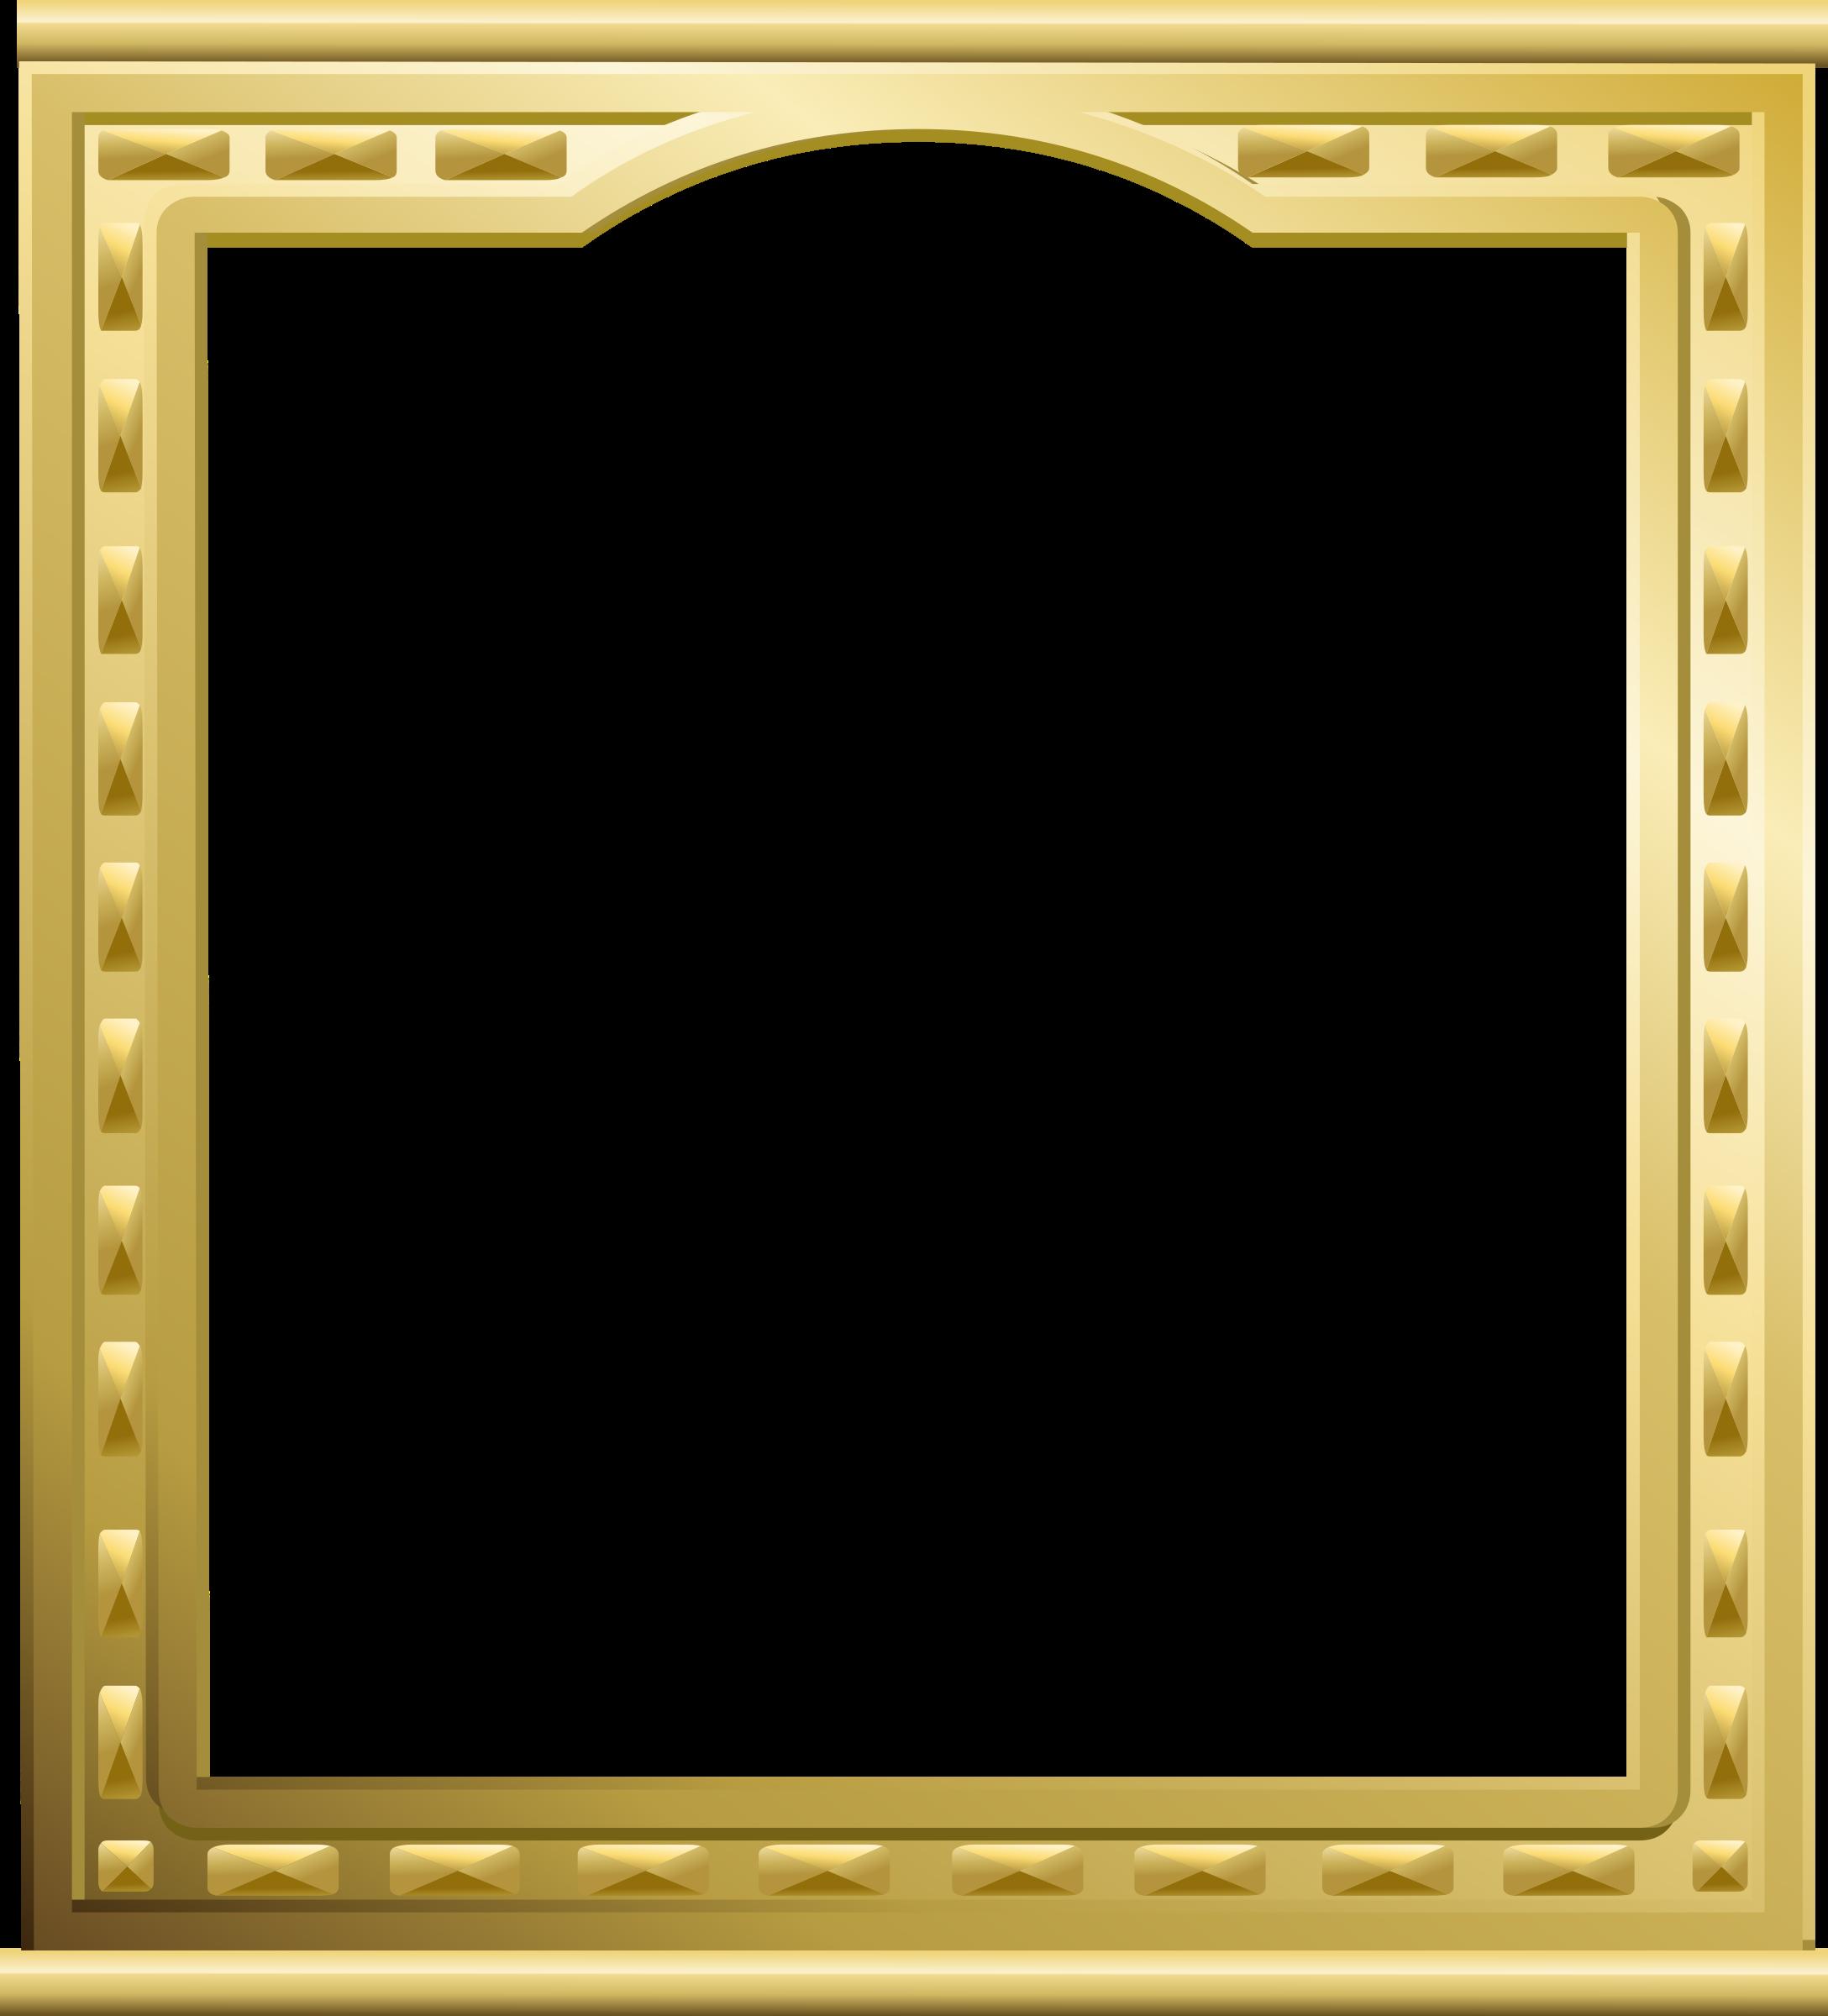 Golden frame | Comic book frames